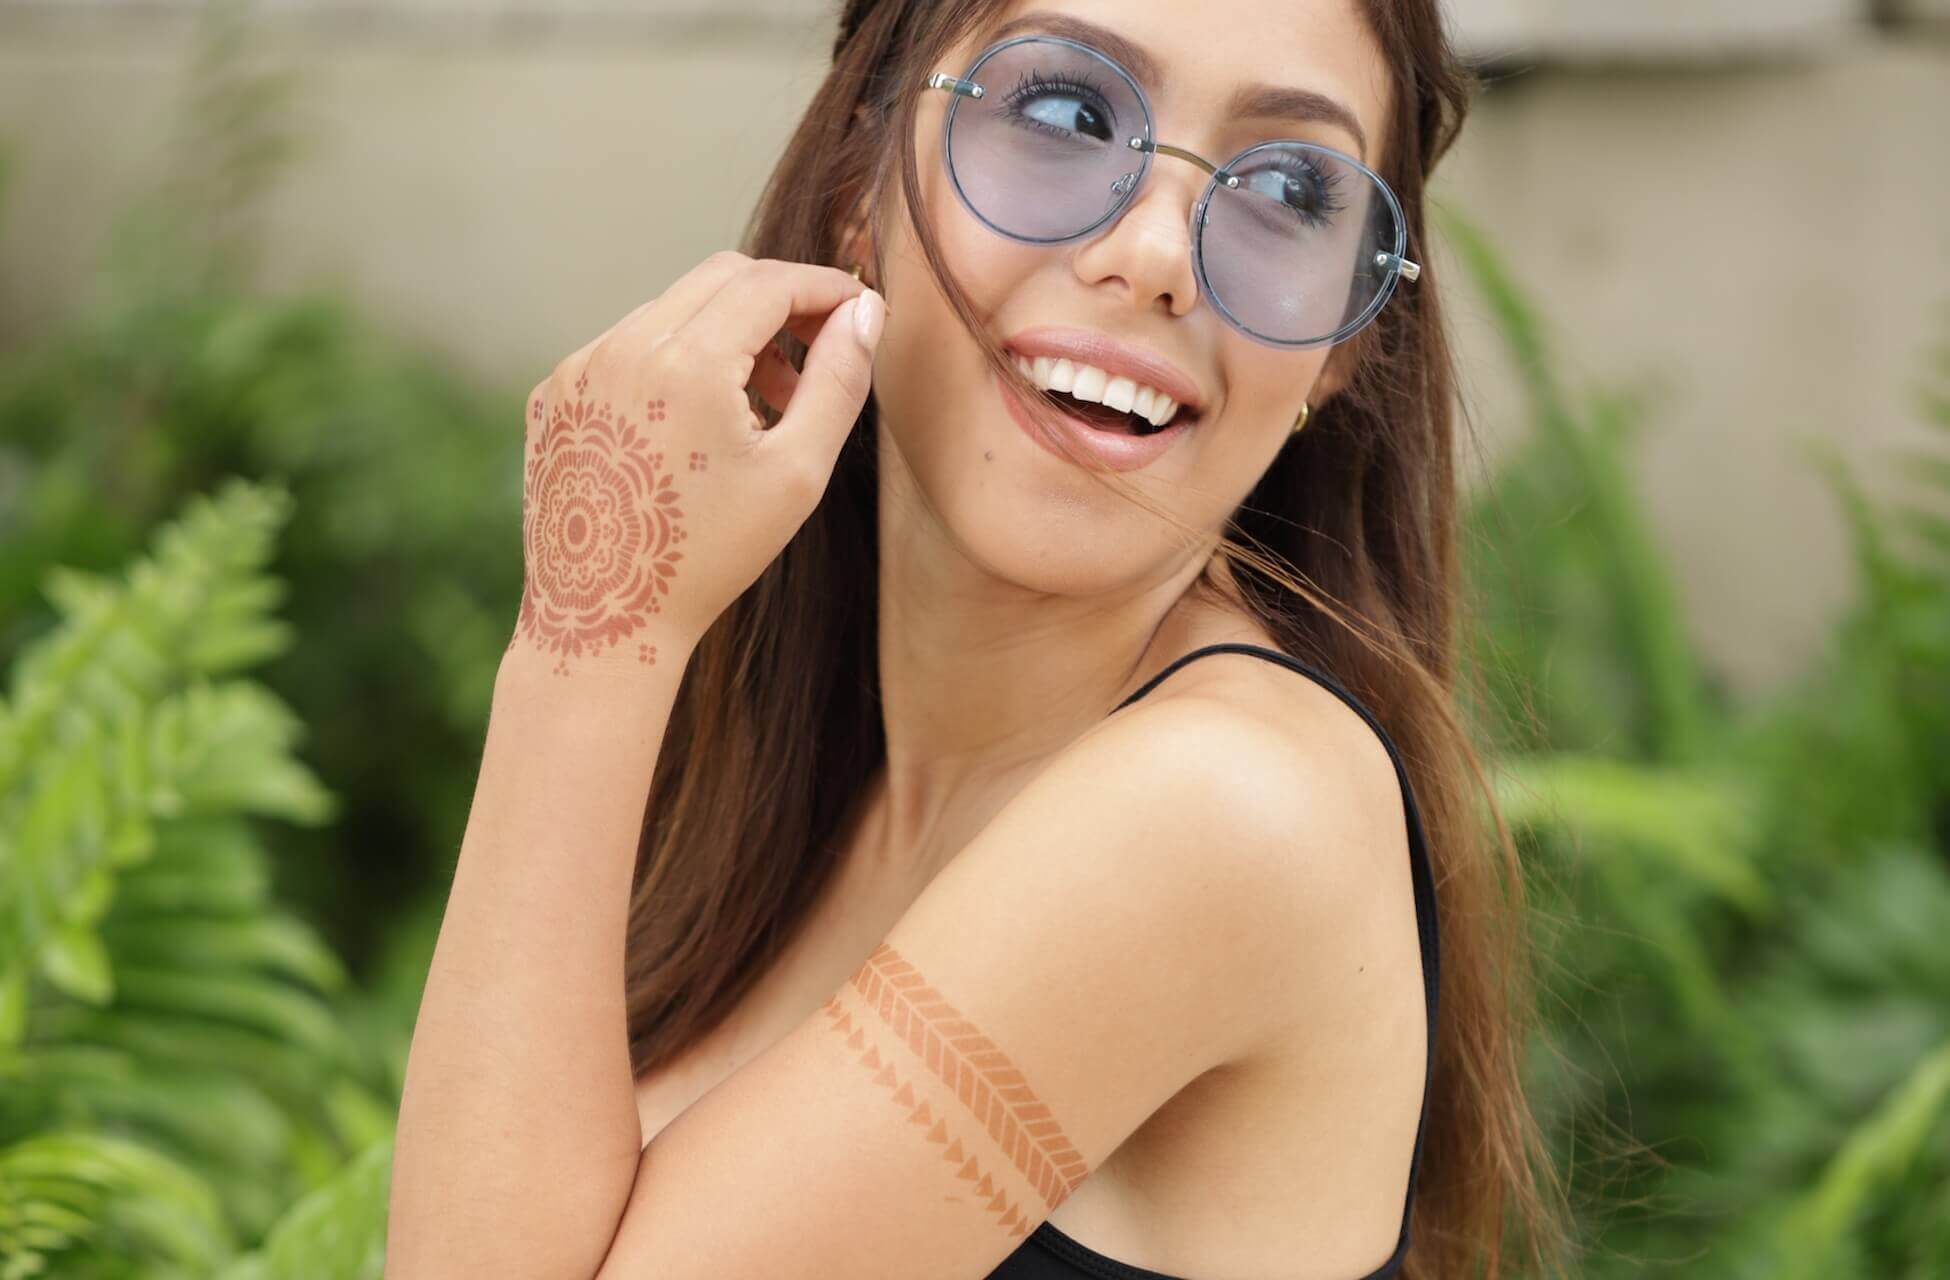 mix-match-henna-tattoos-main